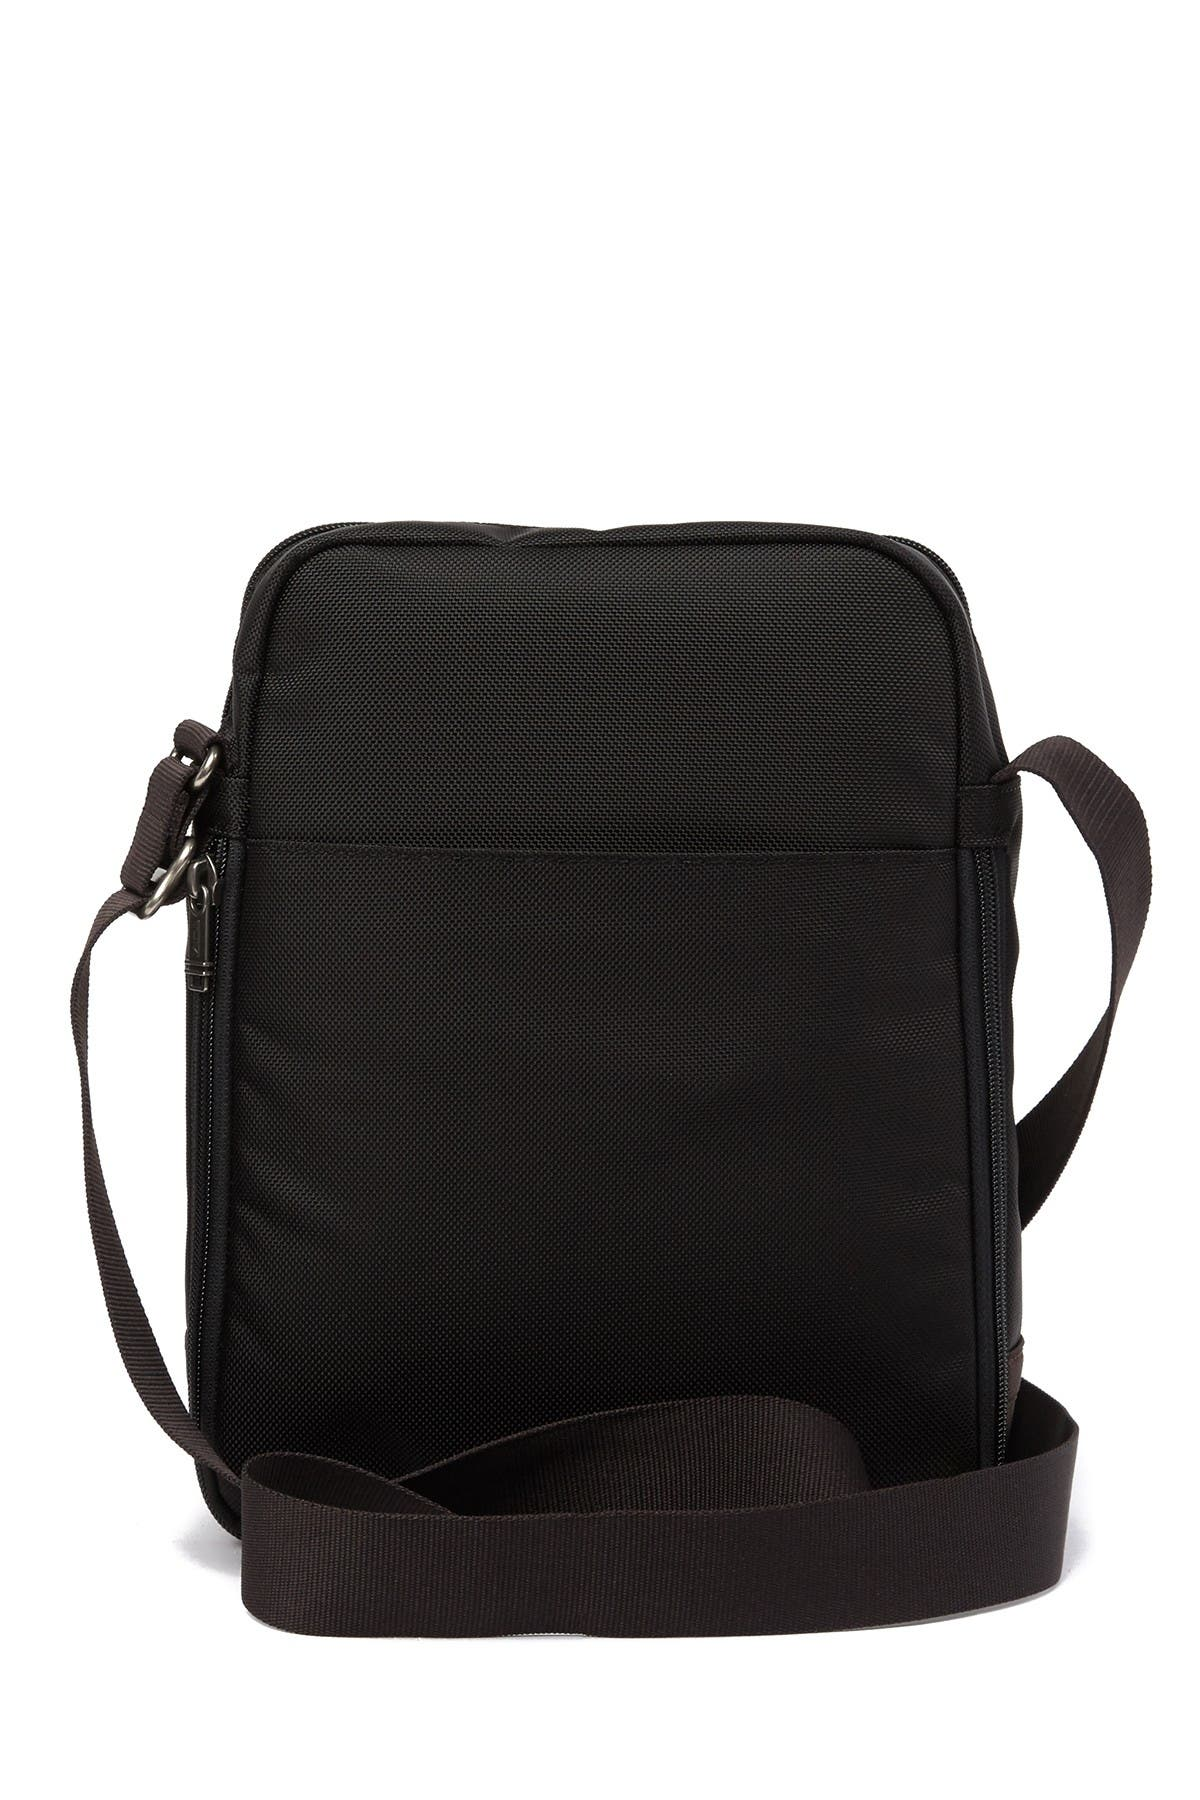 Image of Tumi Quincy Expansion Slim Crossbody Bag